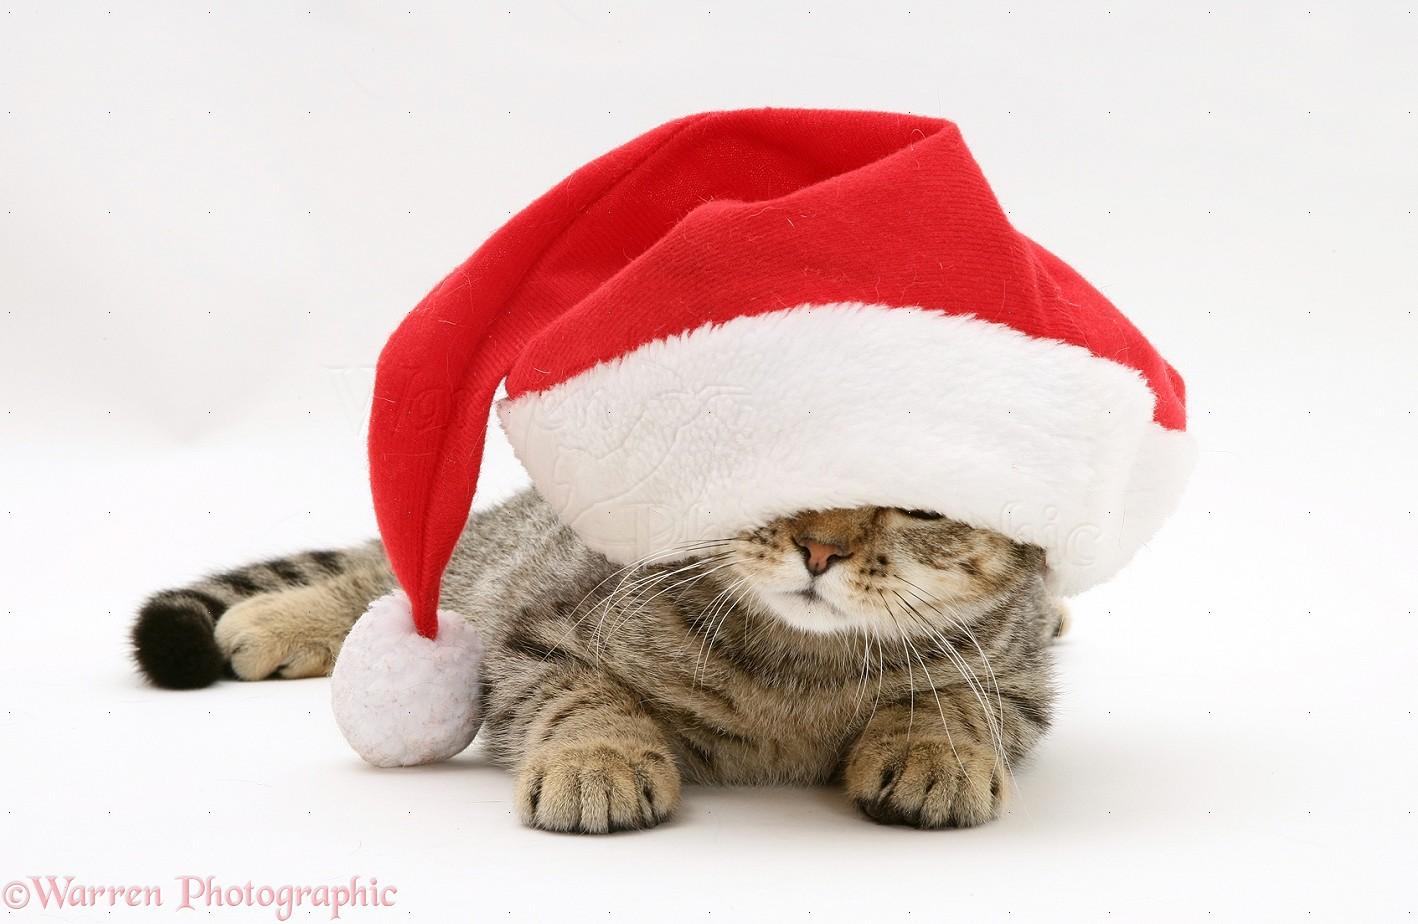 Merry Christmas Modern Tabby Cat Under A Santa Hat Photo Wp20082